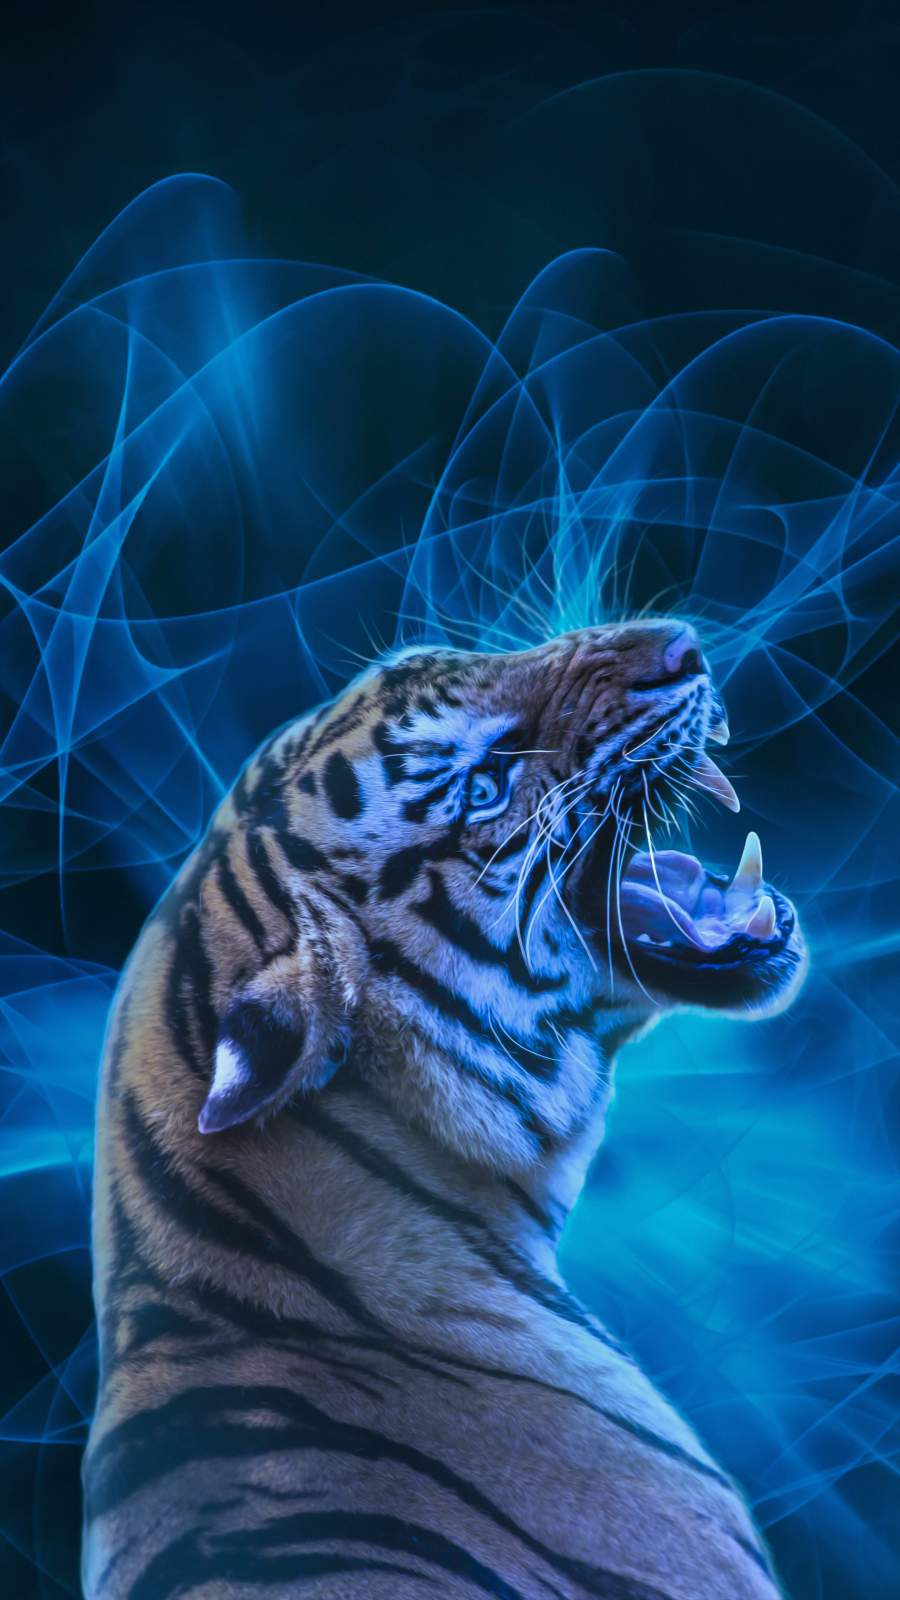 The Predator Tiger